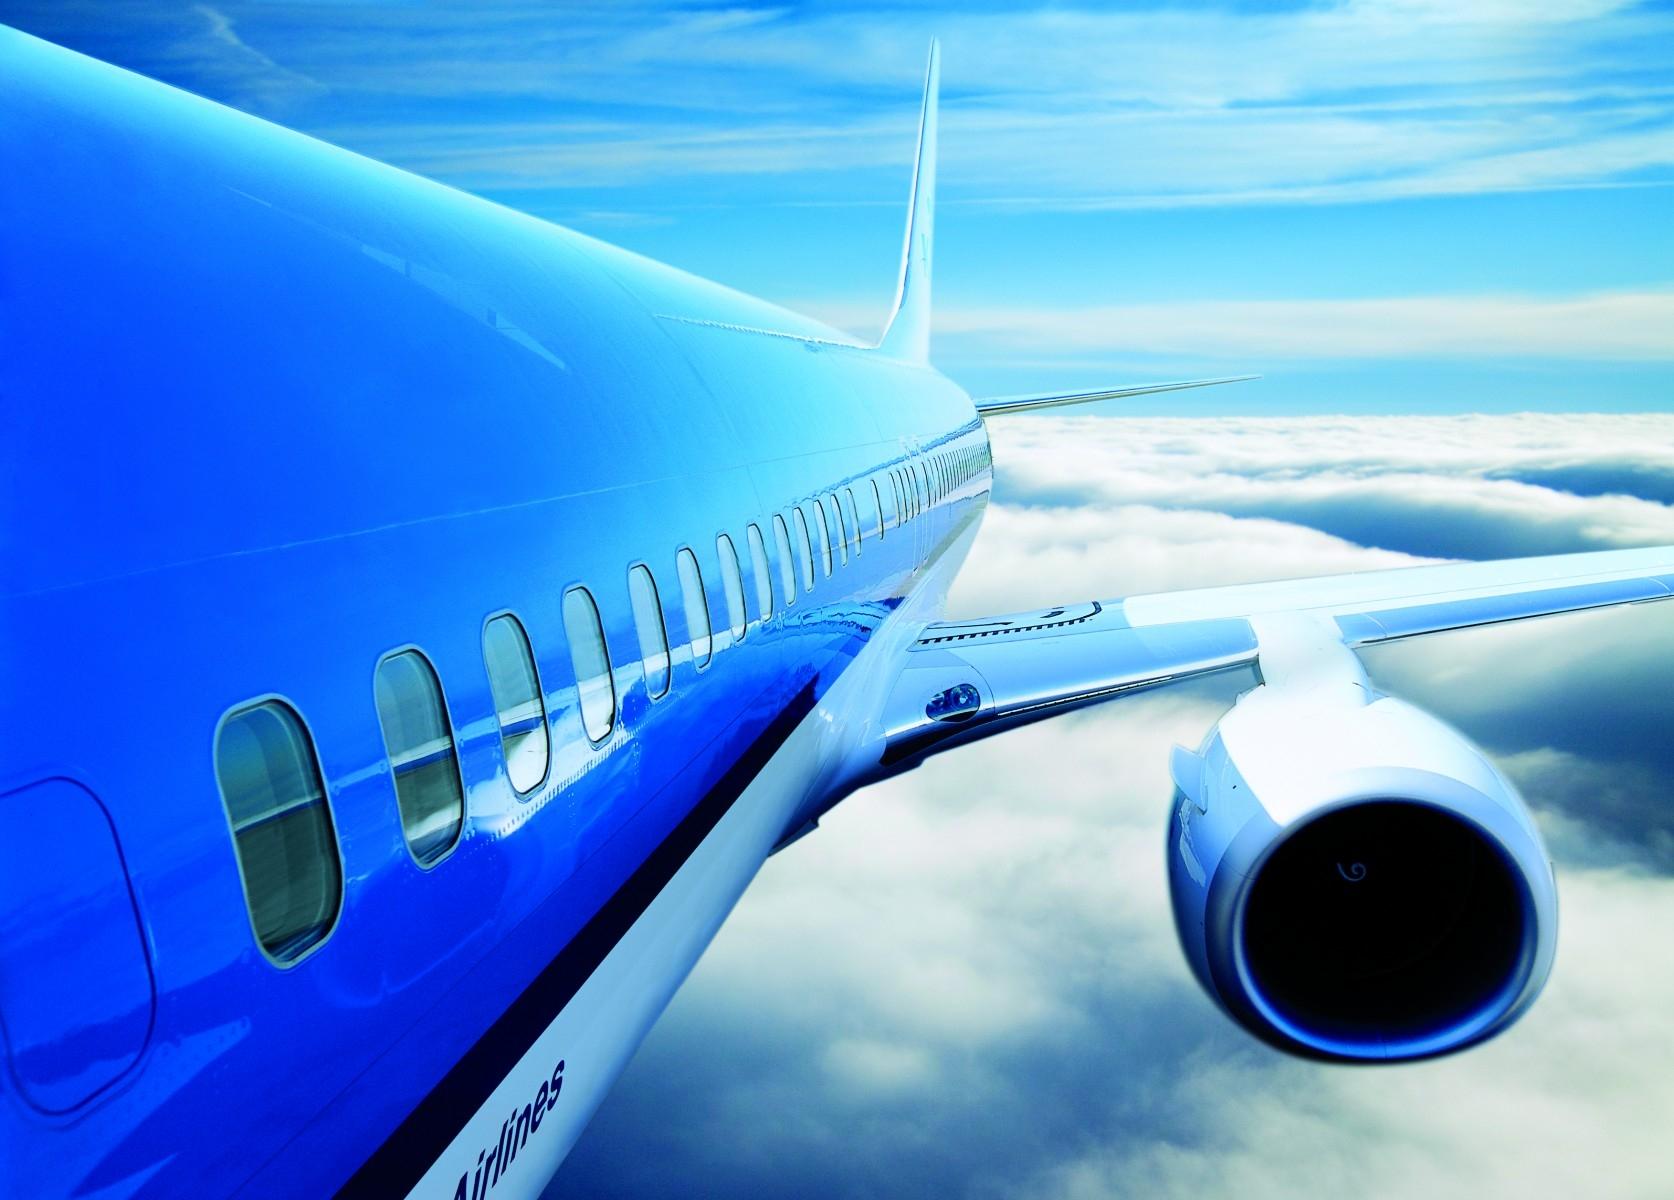 ABN AMRO new partner in KLM's Corporate BioFuel Programme ...